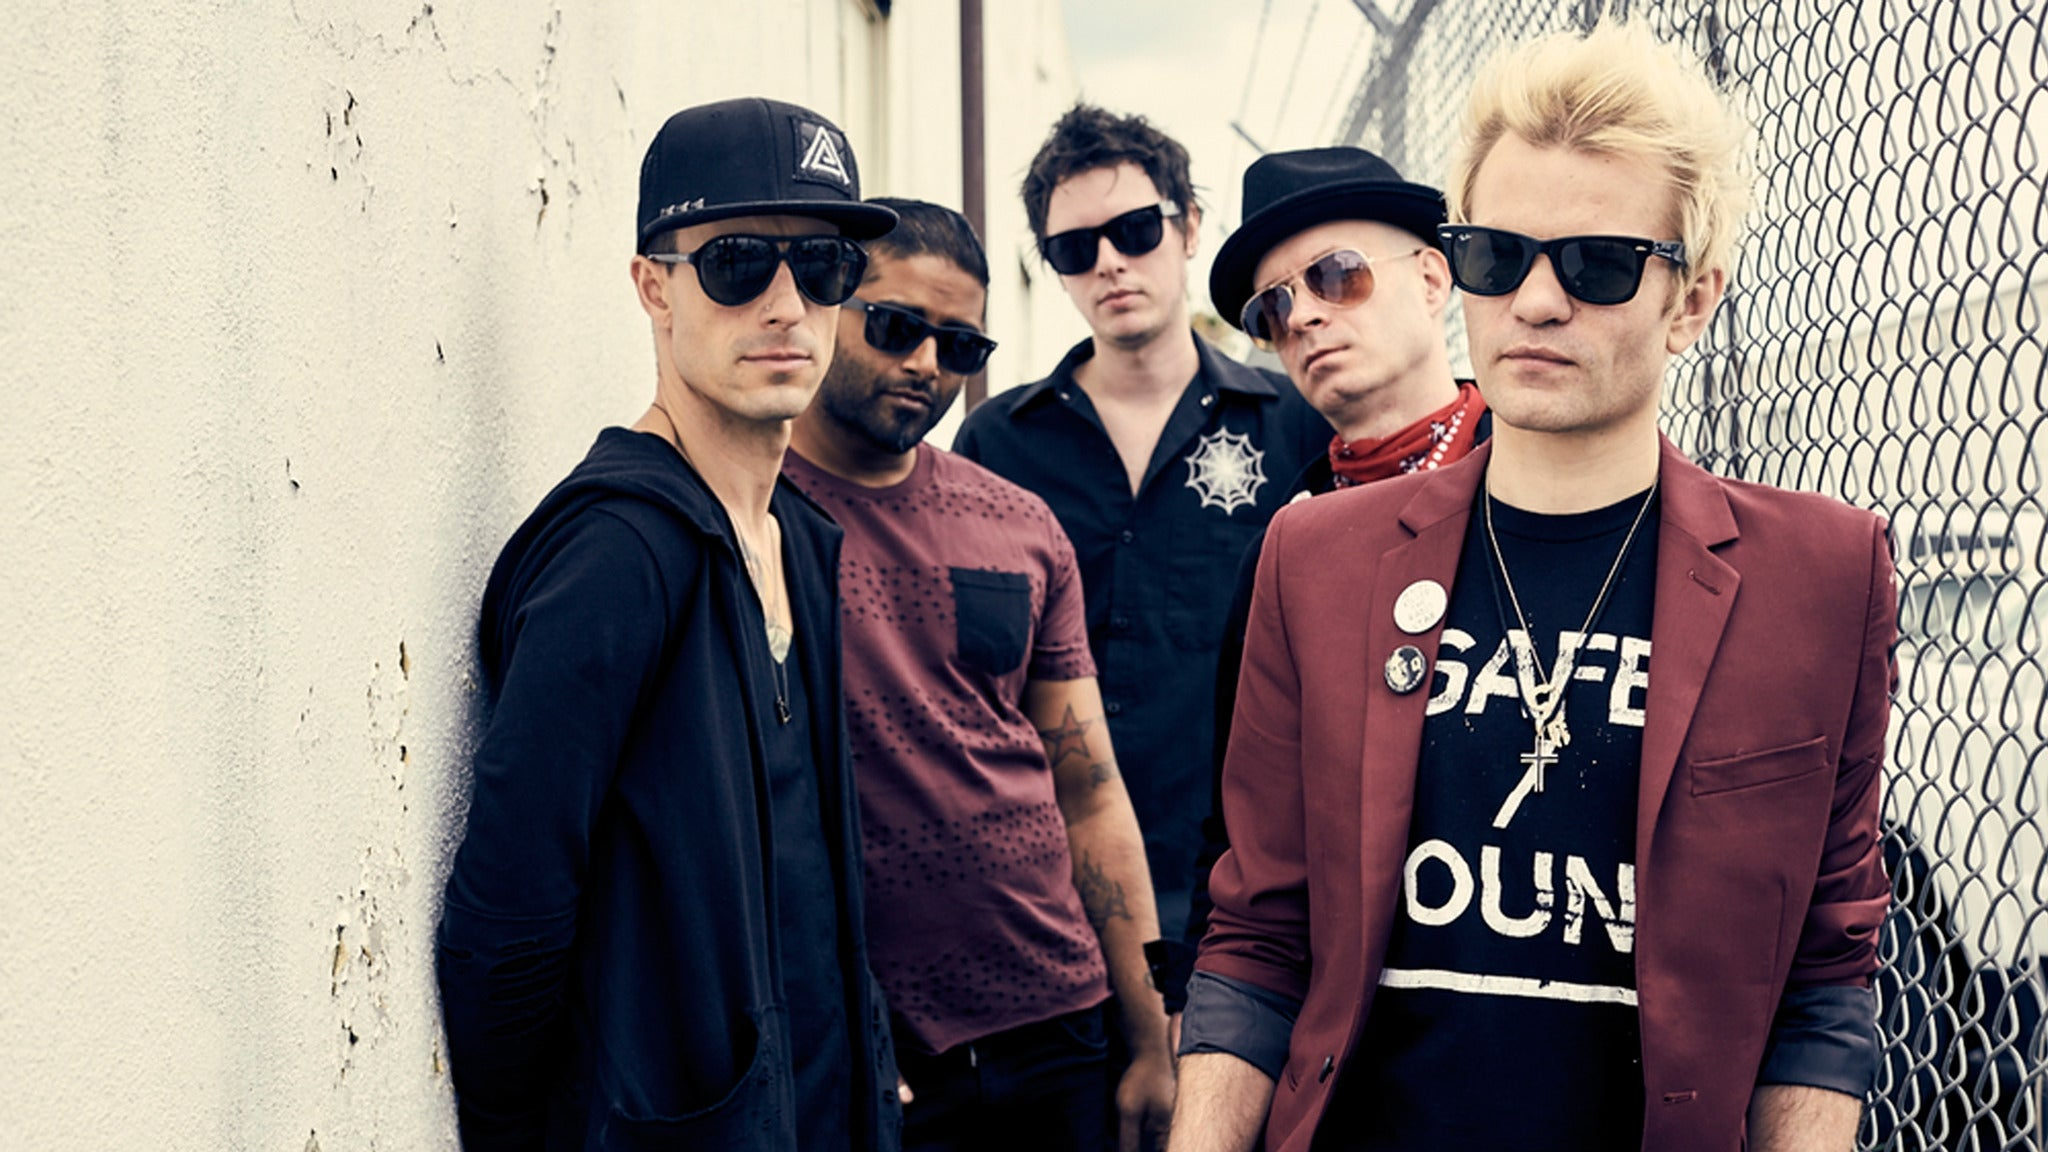 Sum 41's Don't Call It A Sum-Back Tour